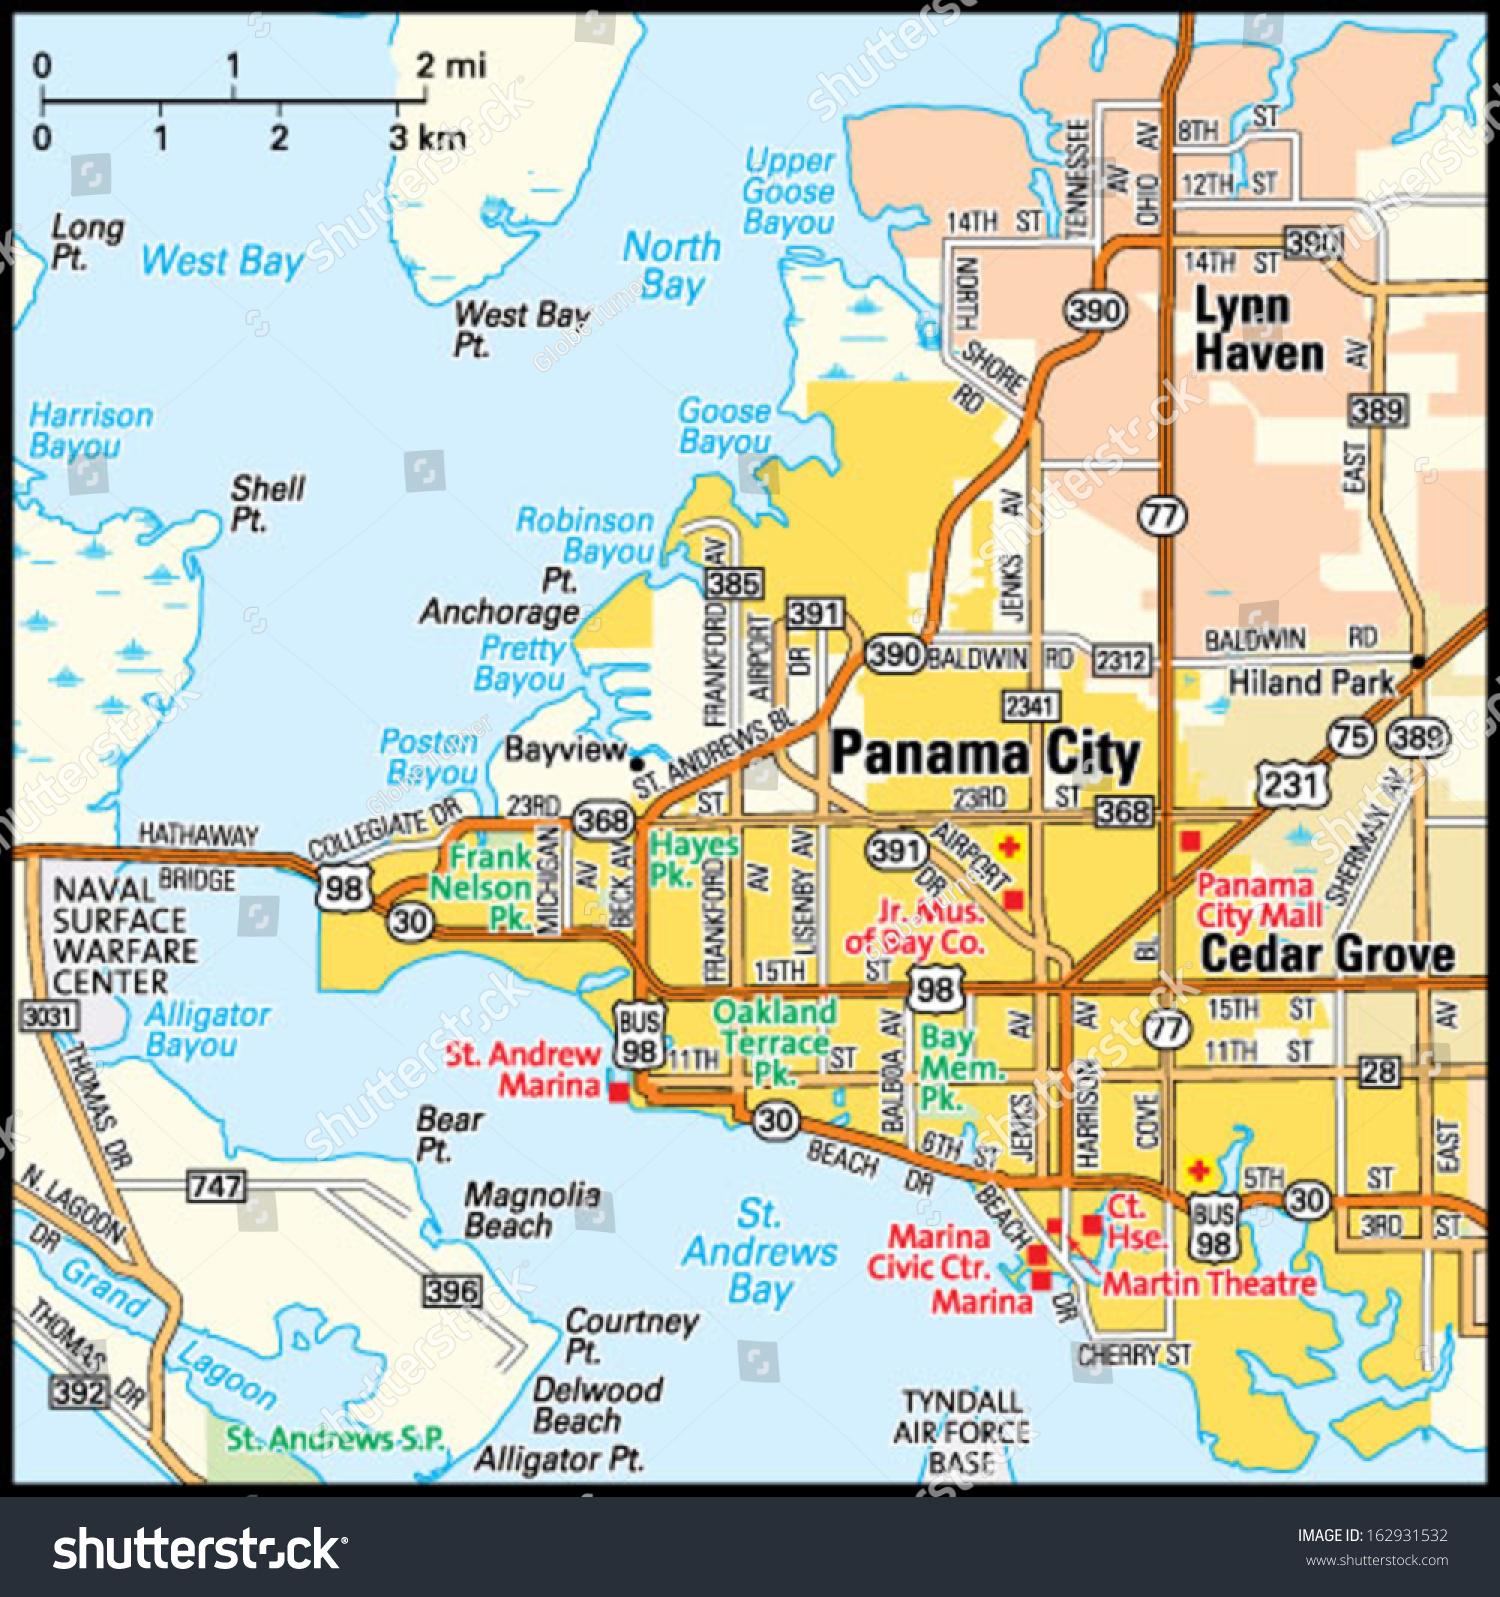 Panama City Florida Map From Image 1 - Ameliabd - Lynn Haven Florida Map